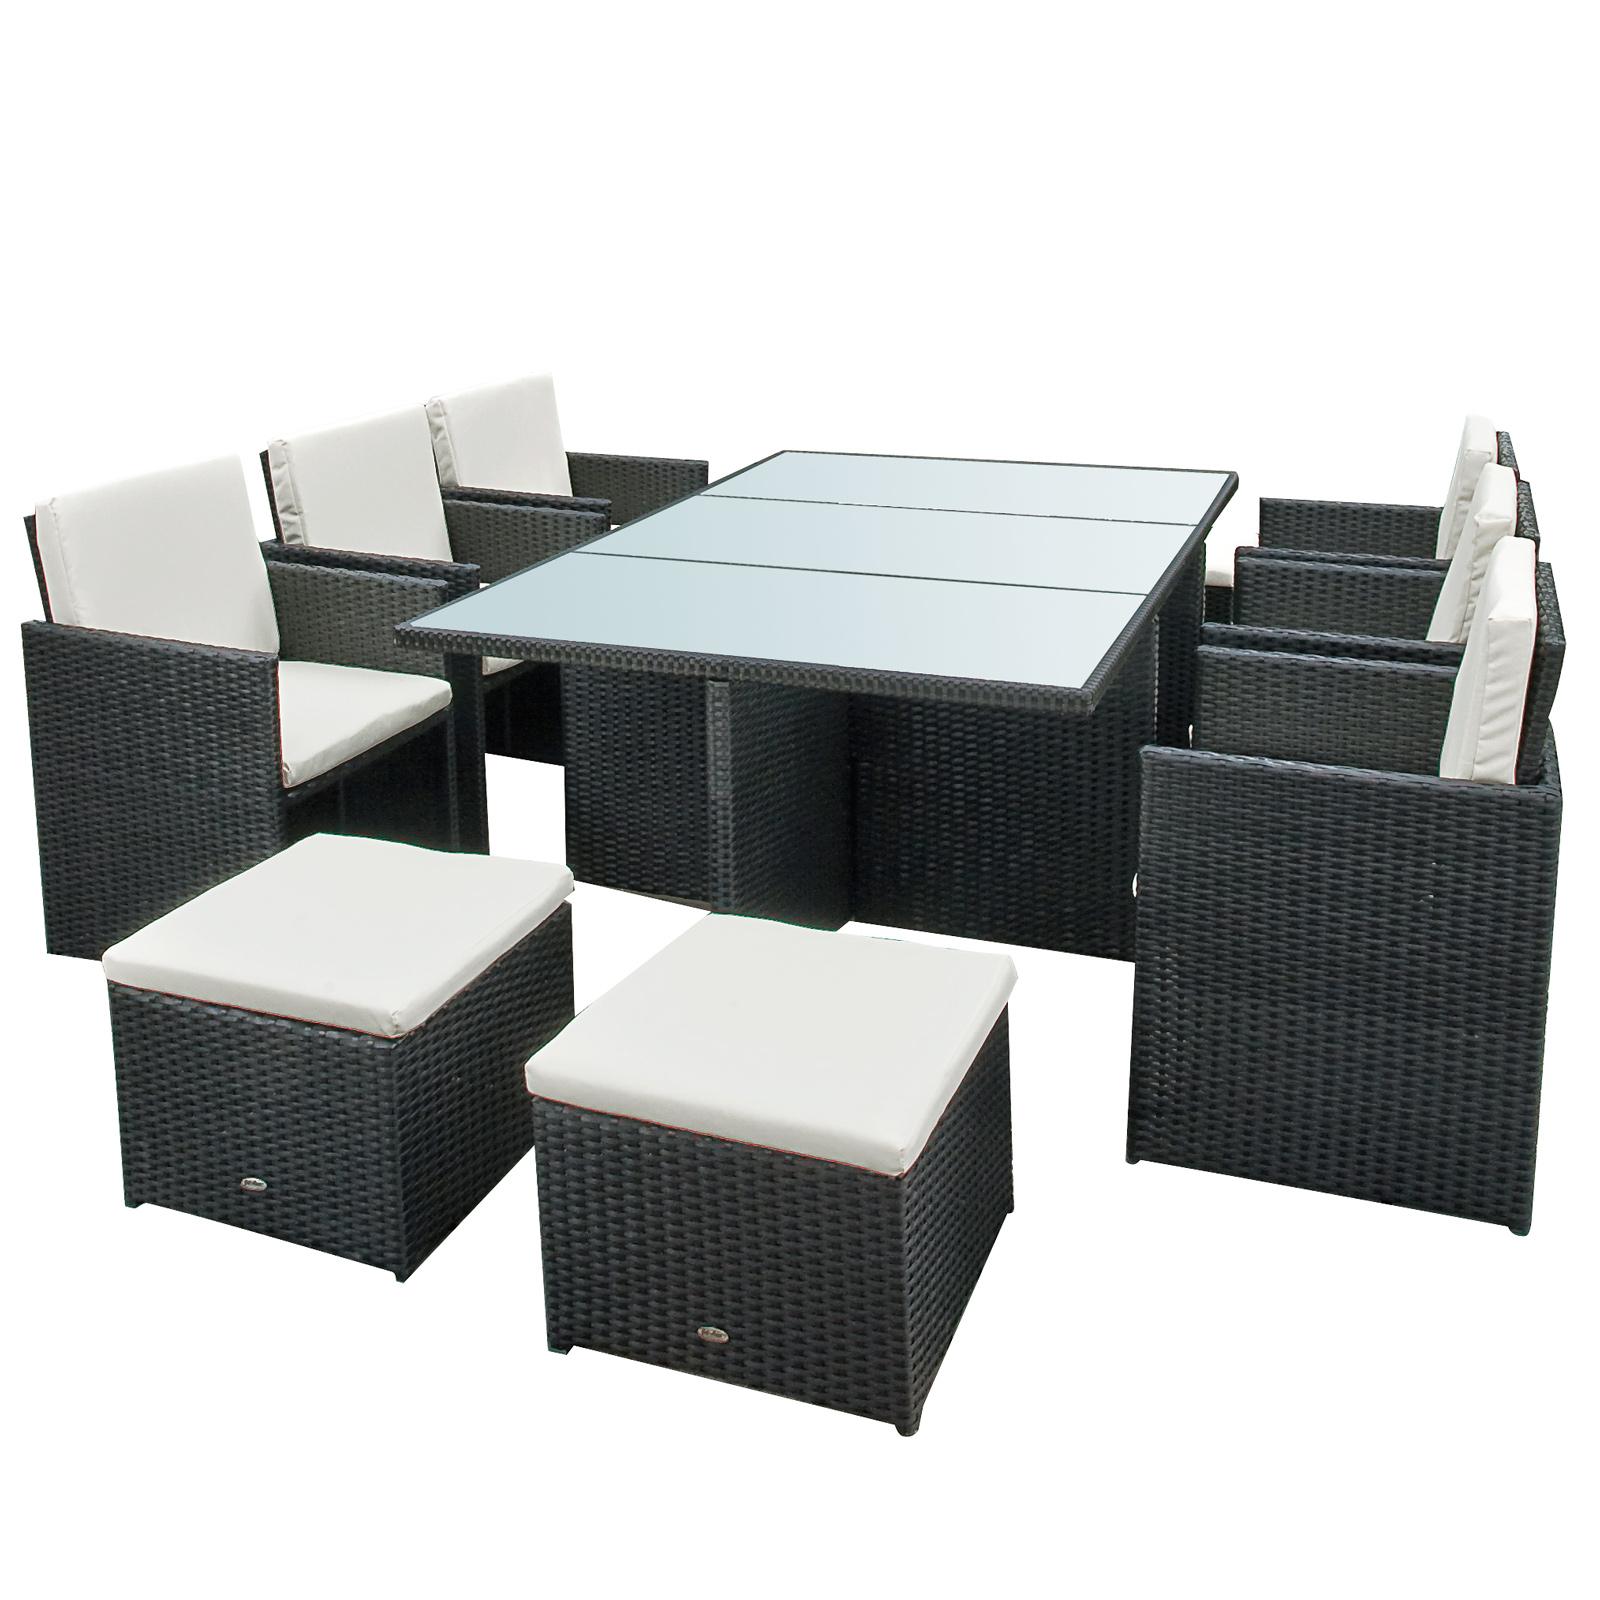 gartenm bel aus polyrattan rattan garten moebel design. Black Bedroom Furniture Sets. Home Design Ideas